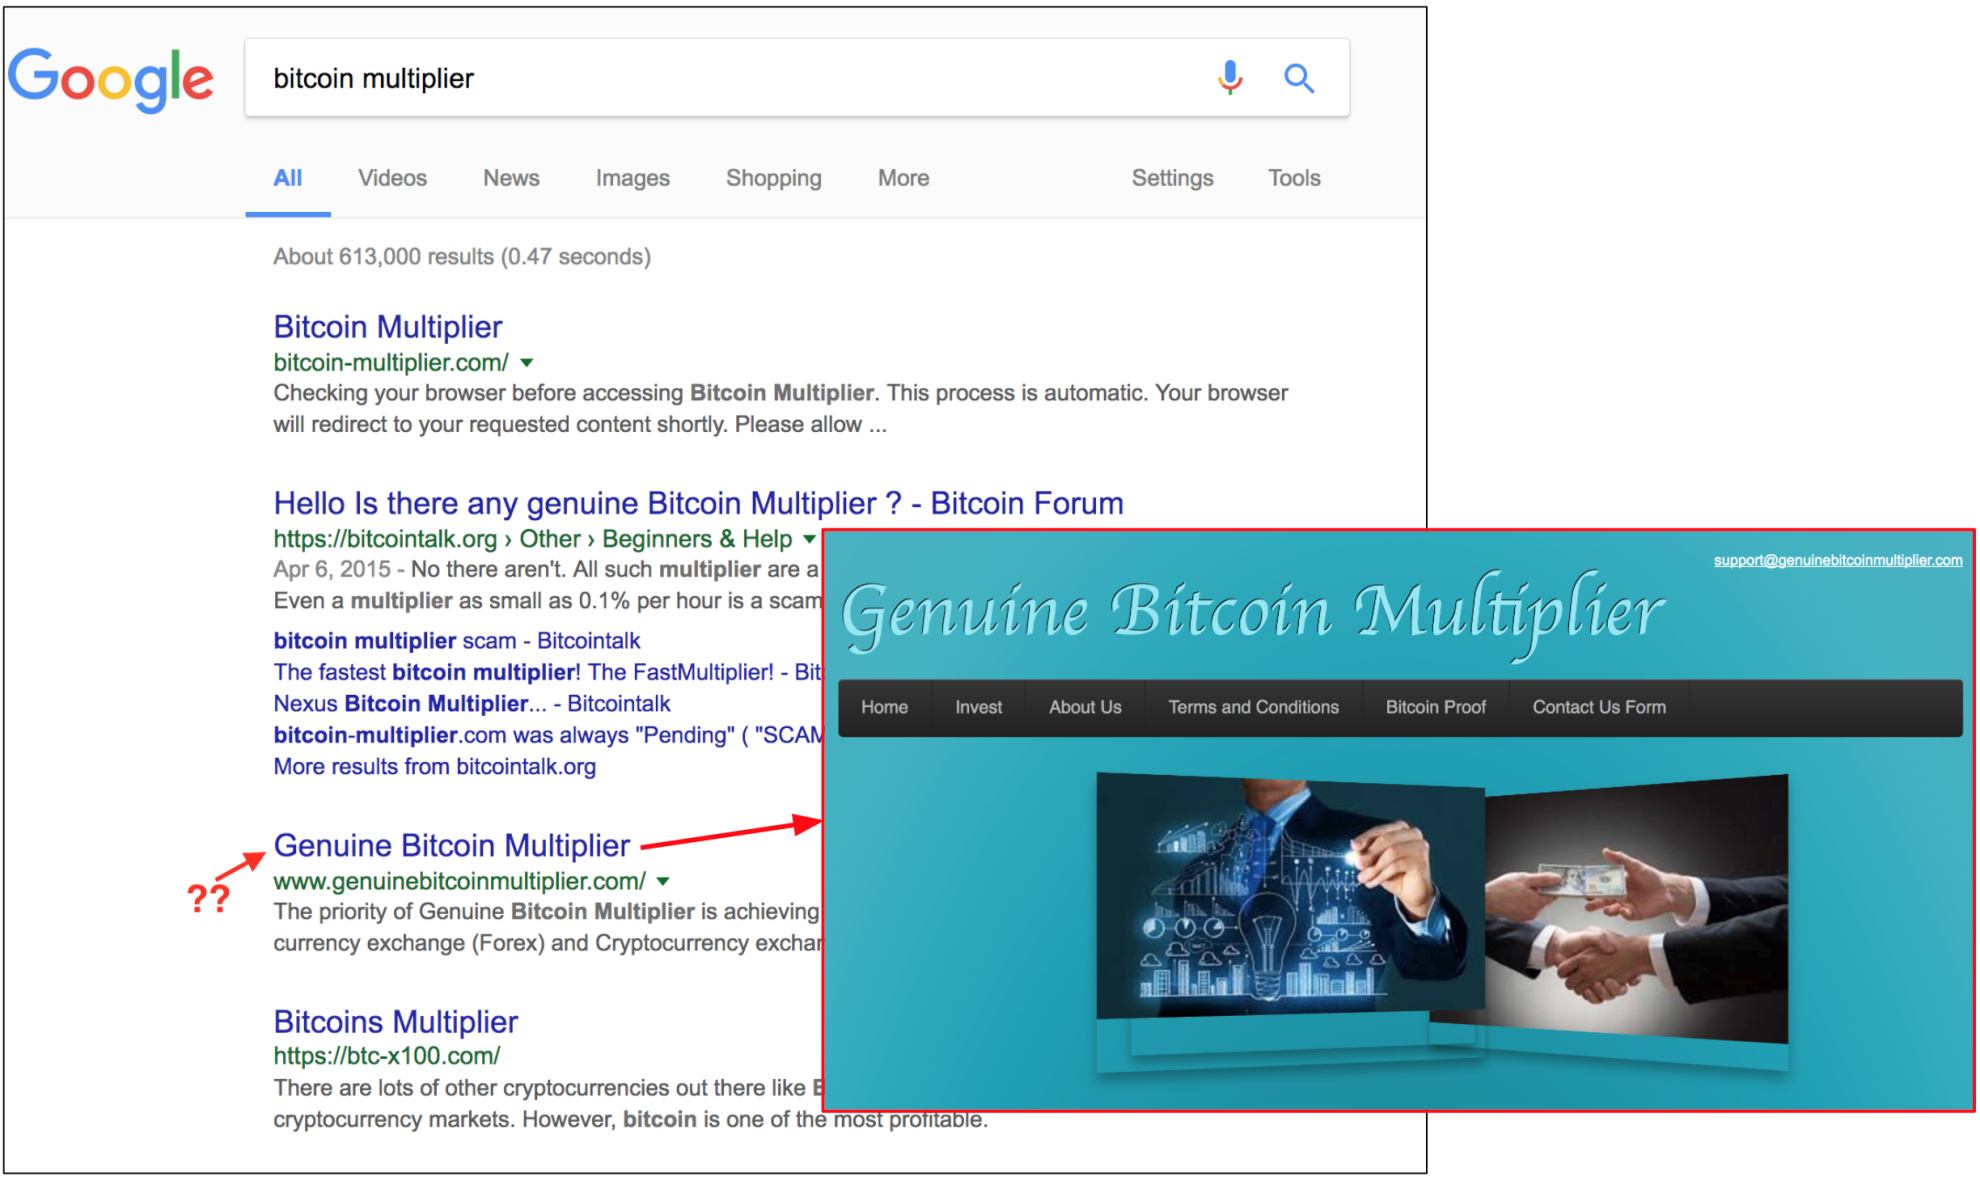 бесплатно bitcoin на русском языке